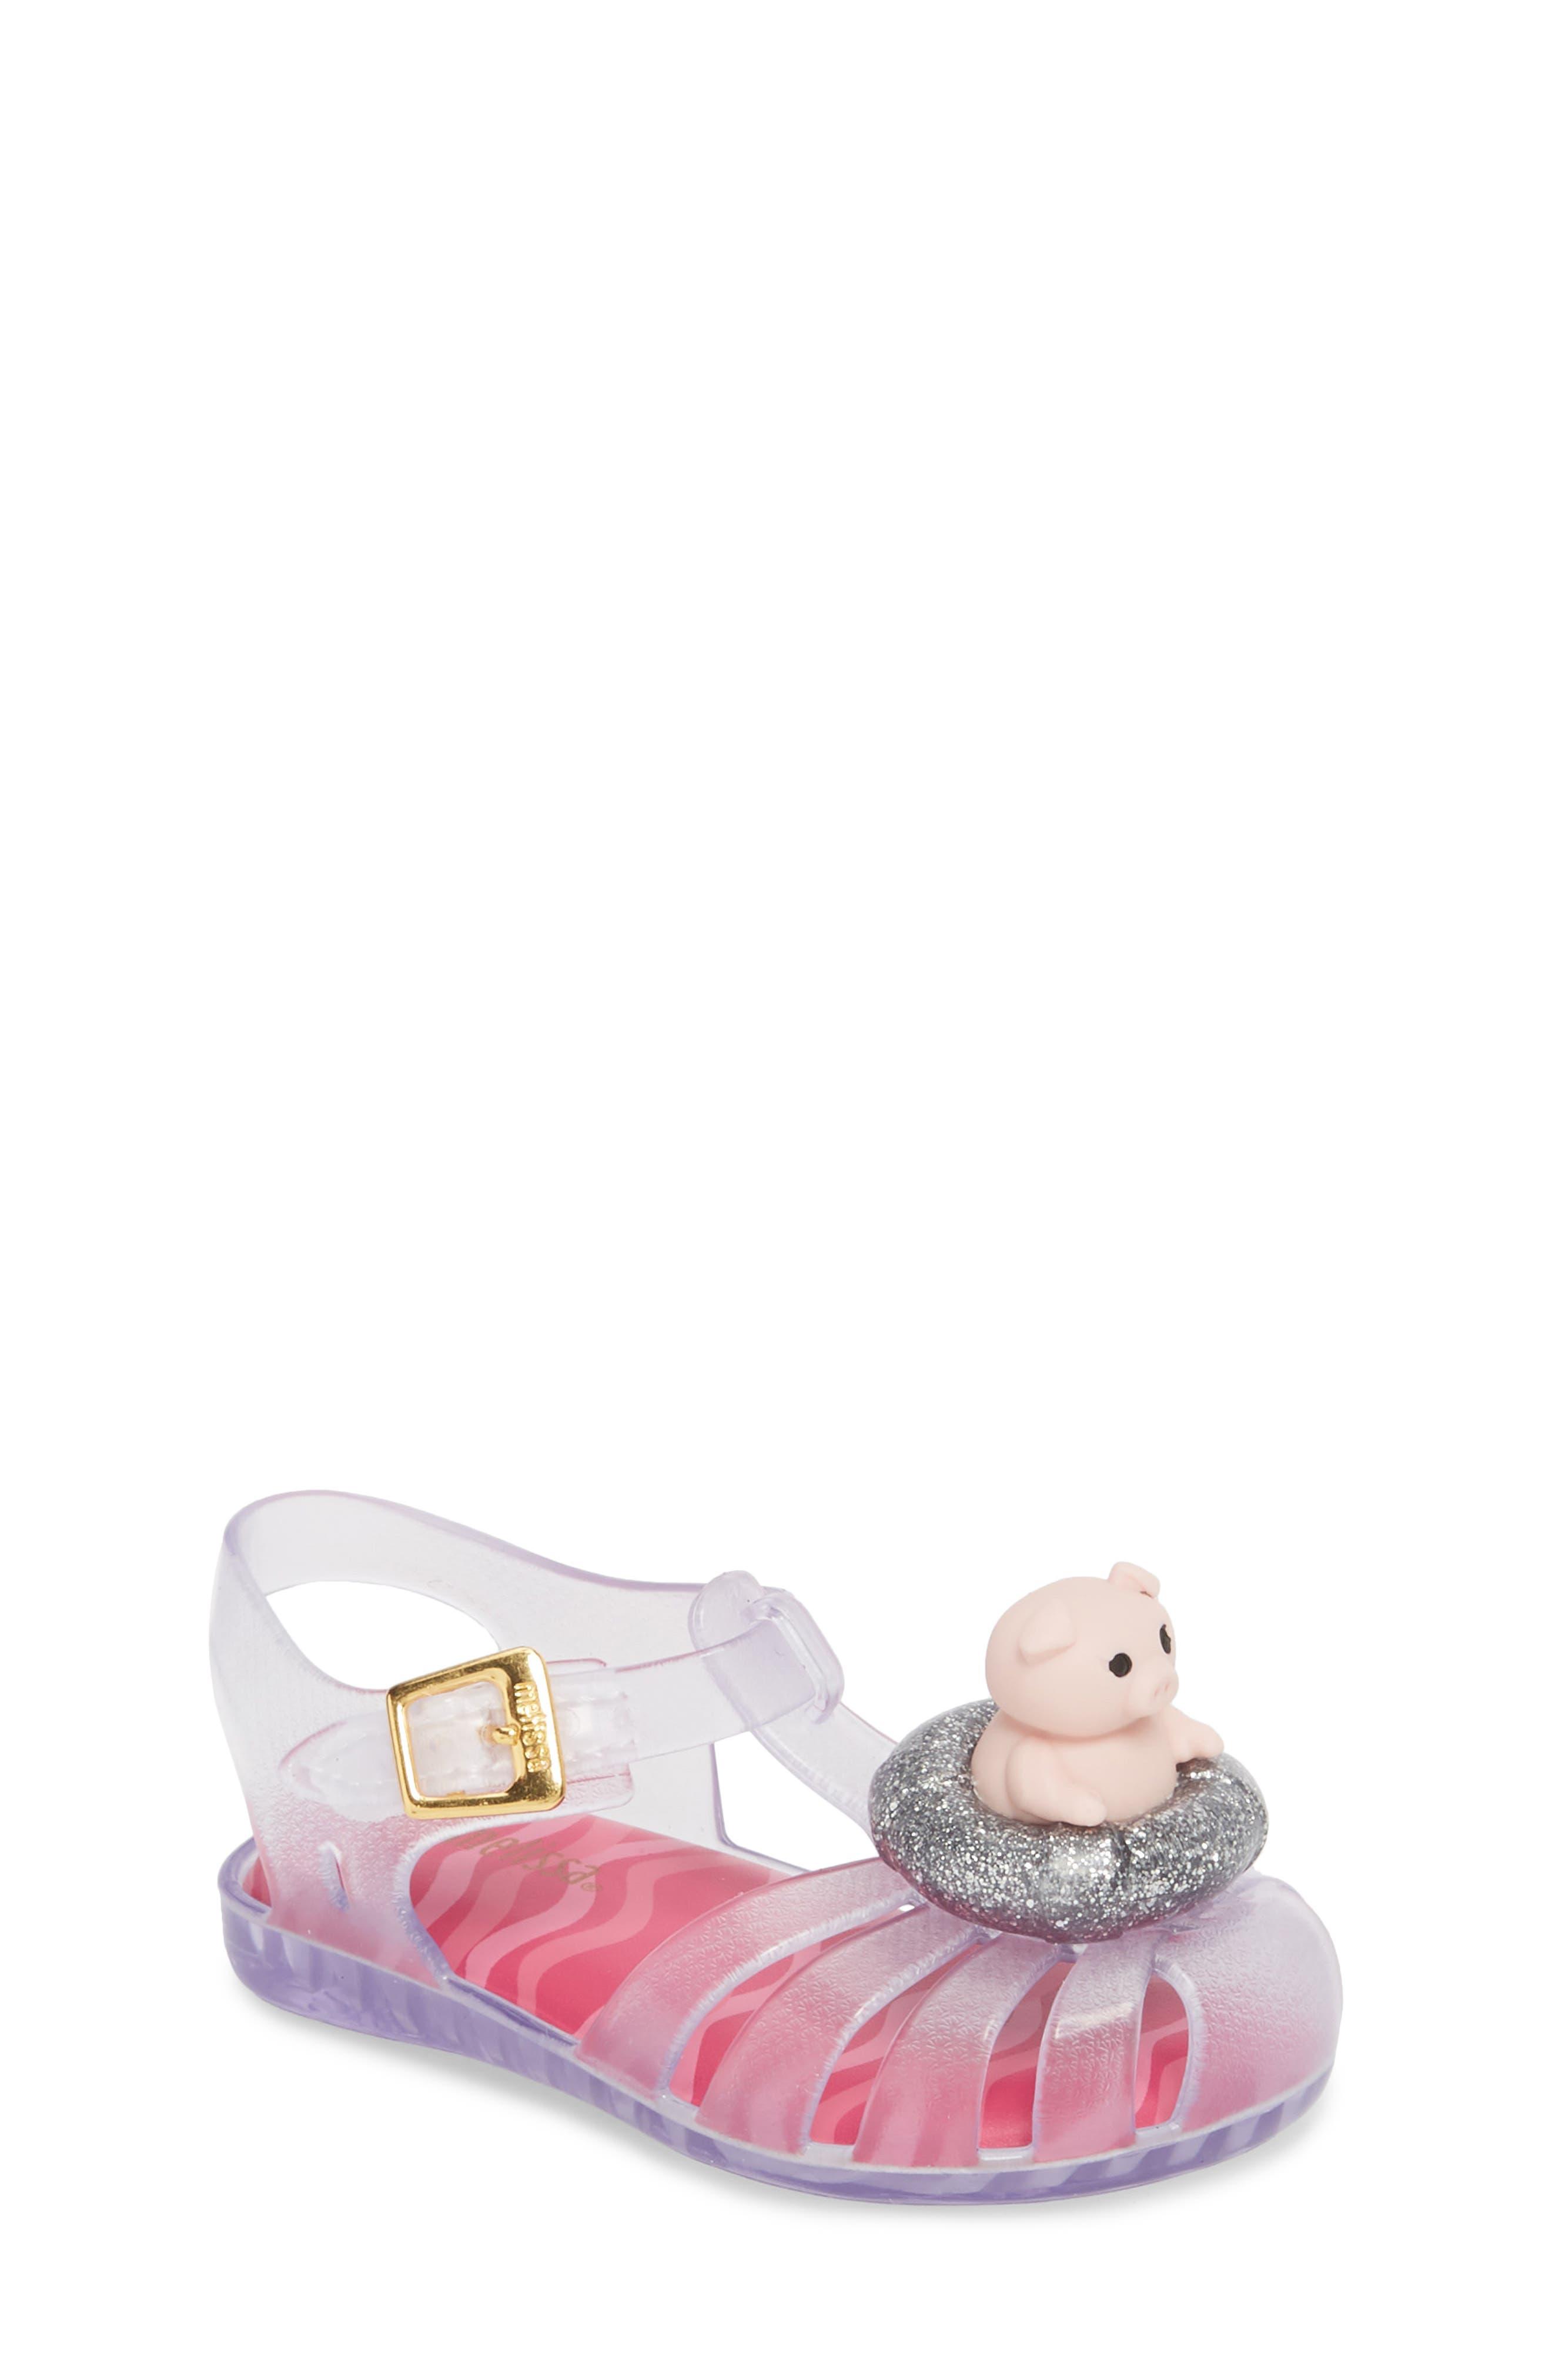 Main Image - Mini Melissa Aranha XI Jelly Sandal (Walker & Toddler)